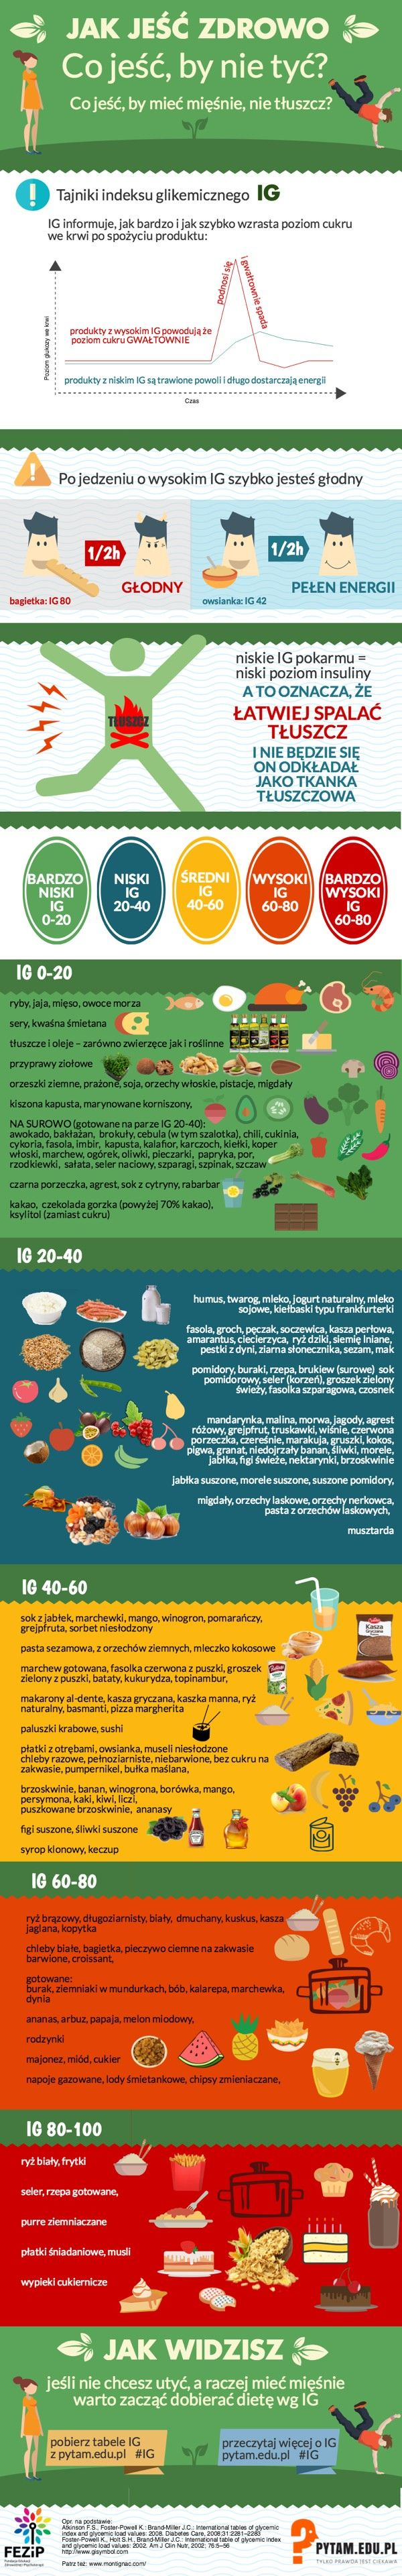 indeks glikemiczny infografika